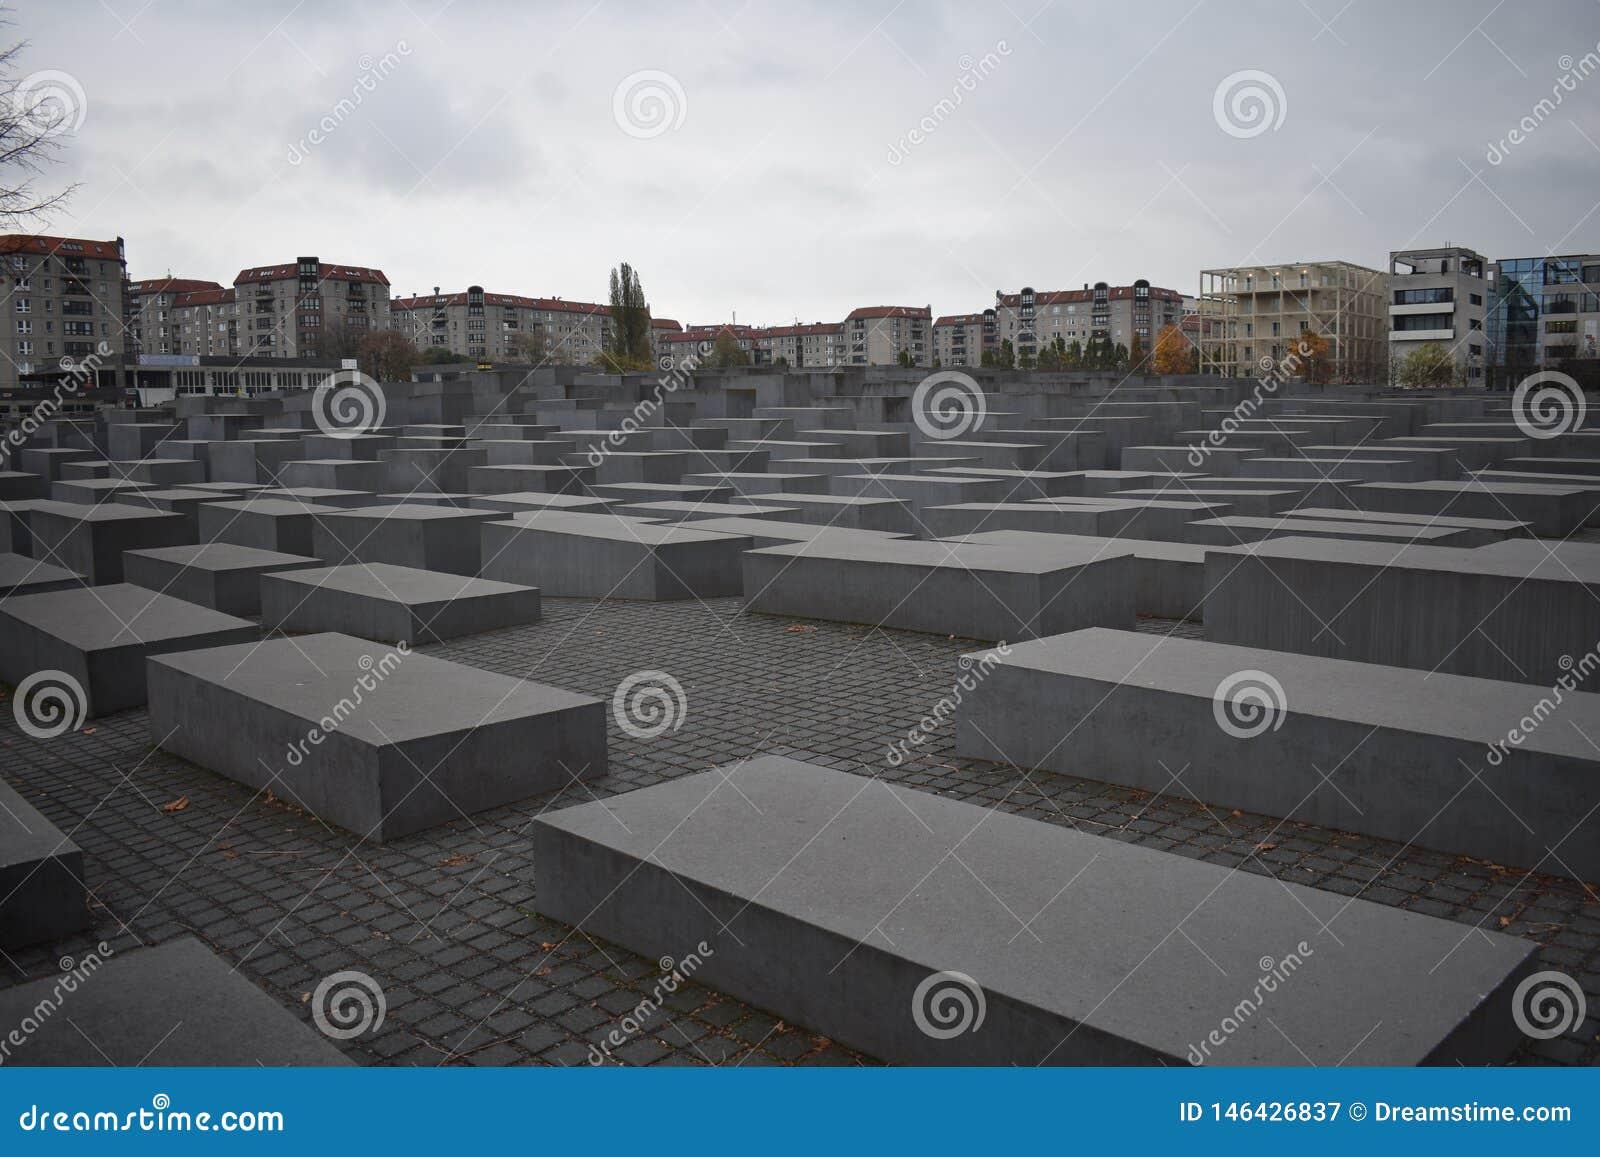 Monumento a los jud?os asesinados de Europa en Berl?n